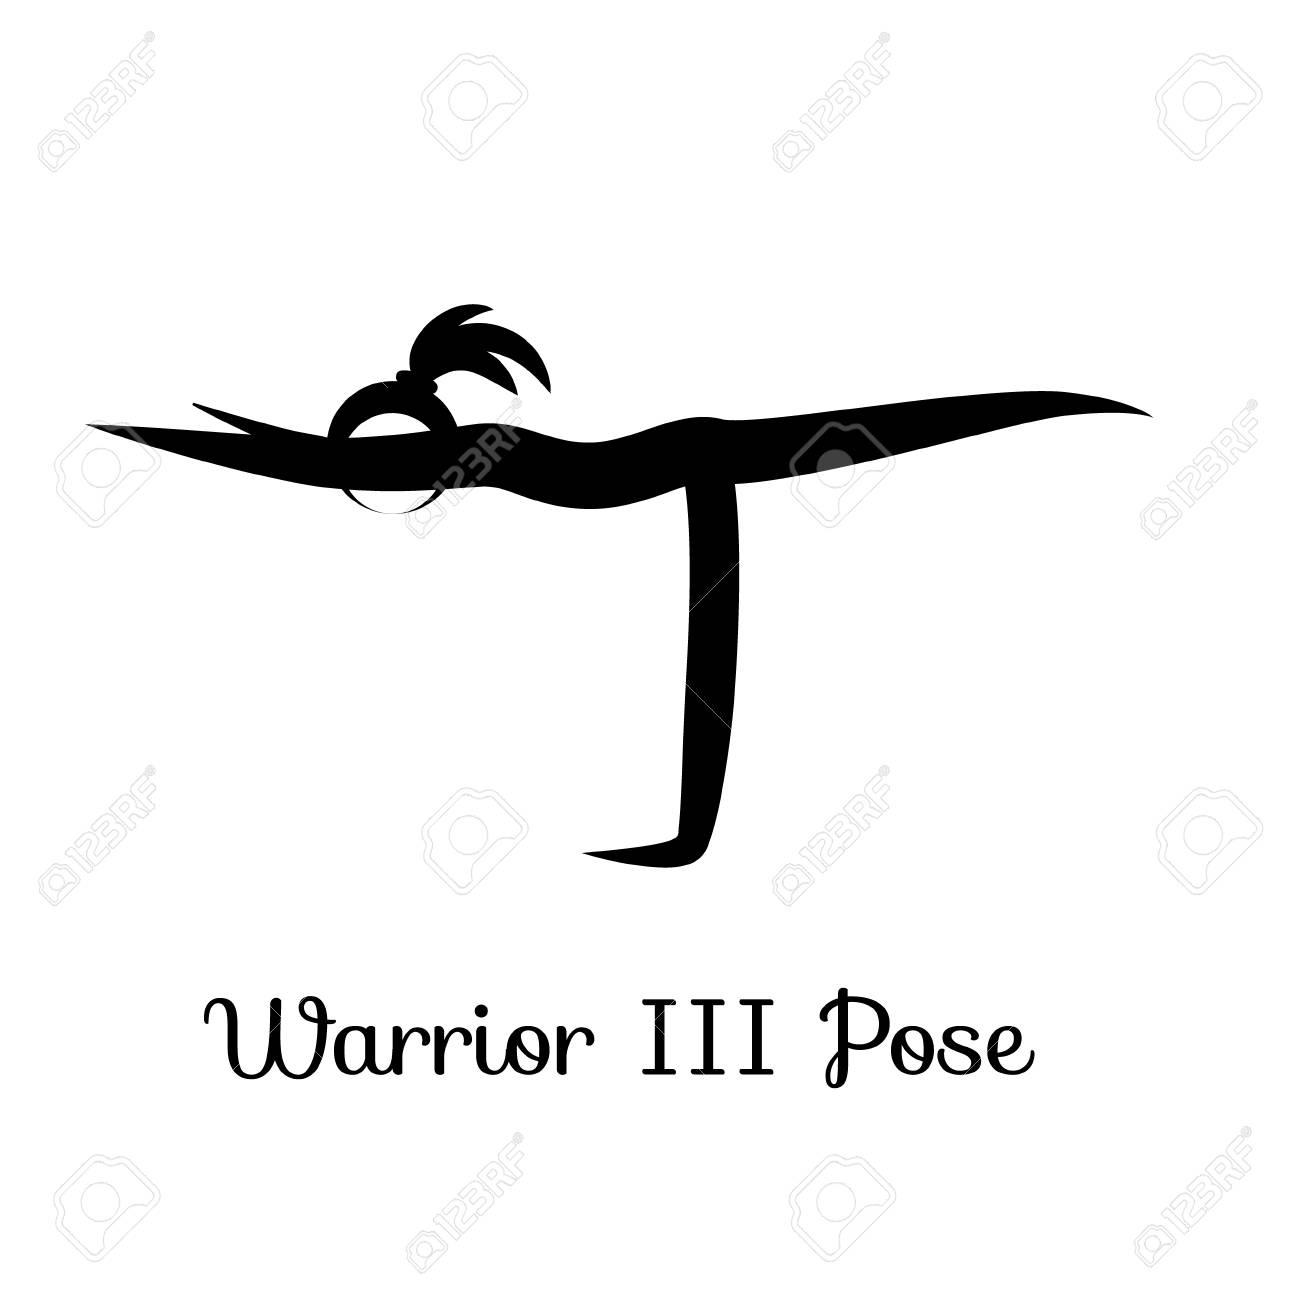 Warrior III Pose Virabhadrasana Yoga Position Vector